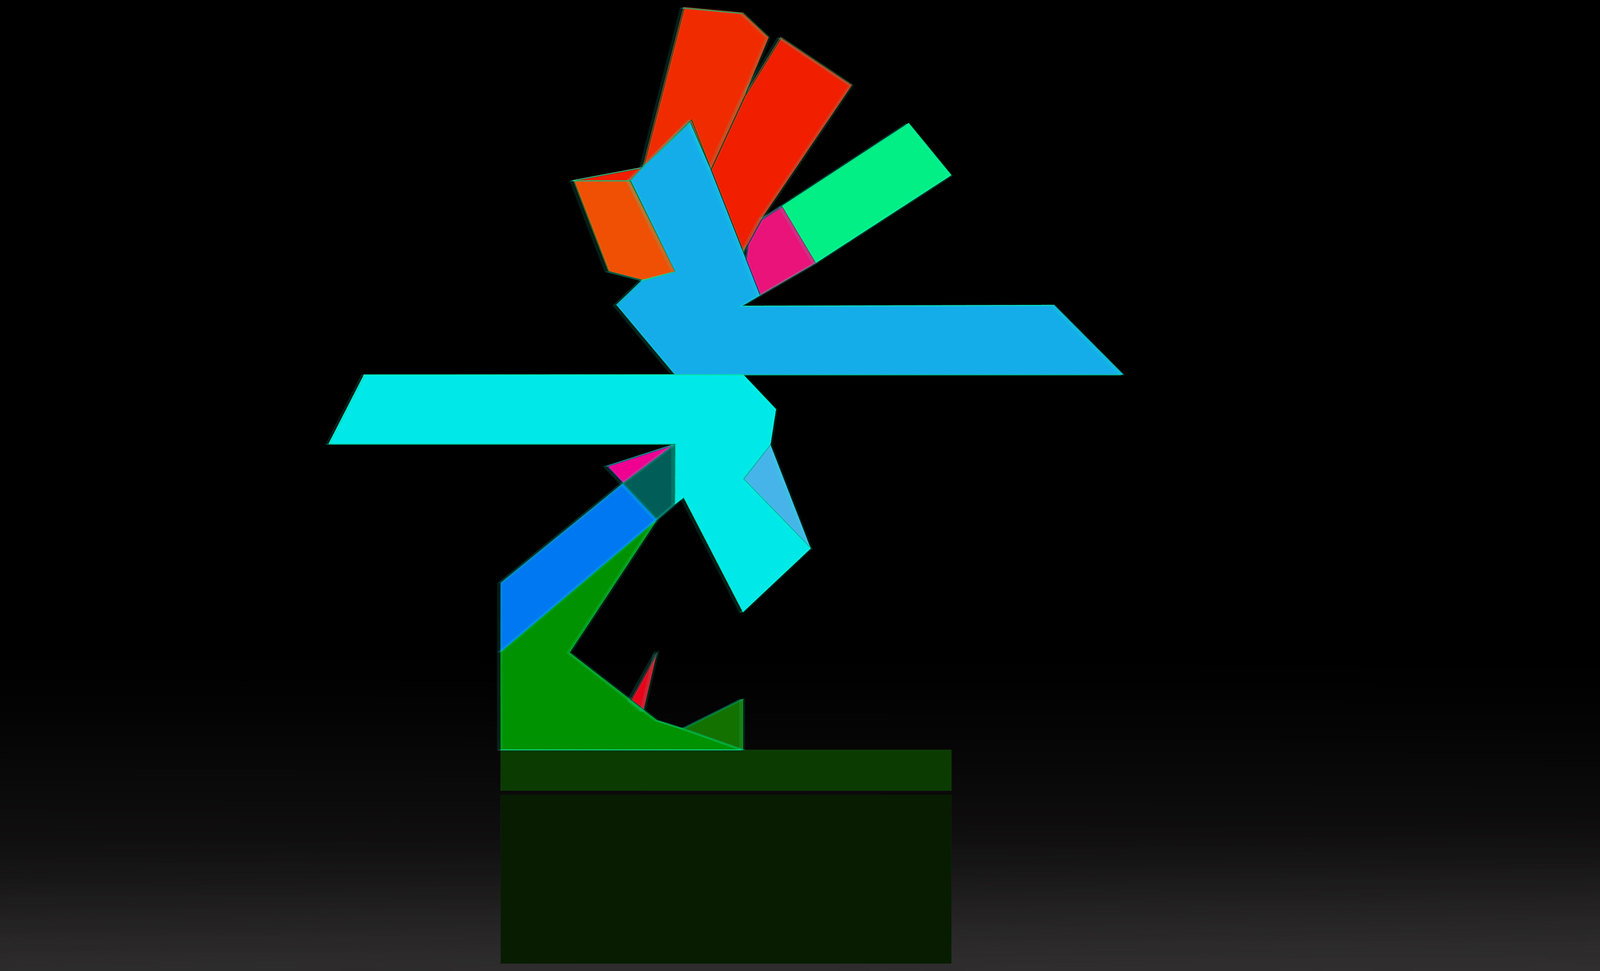 Escultura MAM mx 023